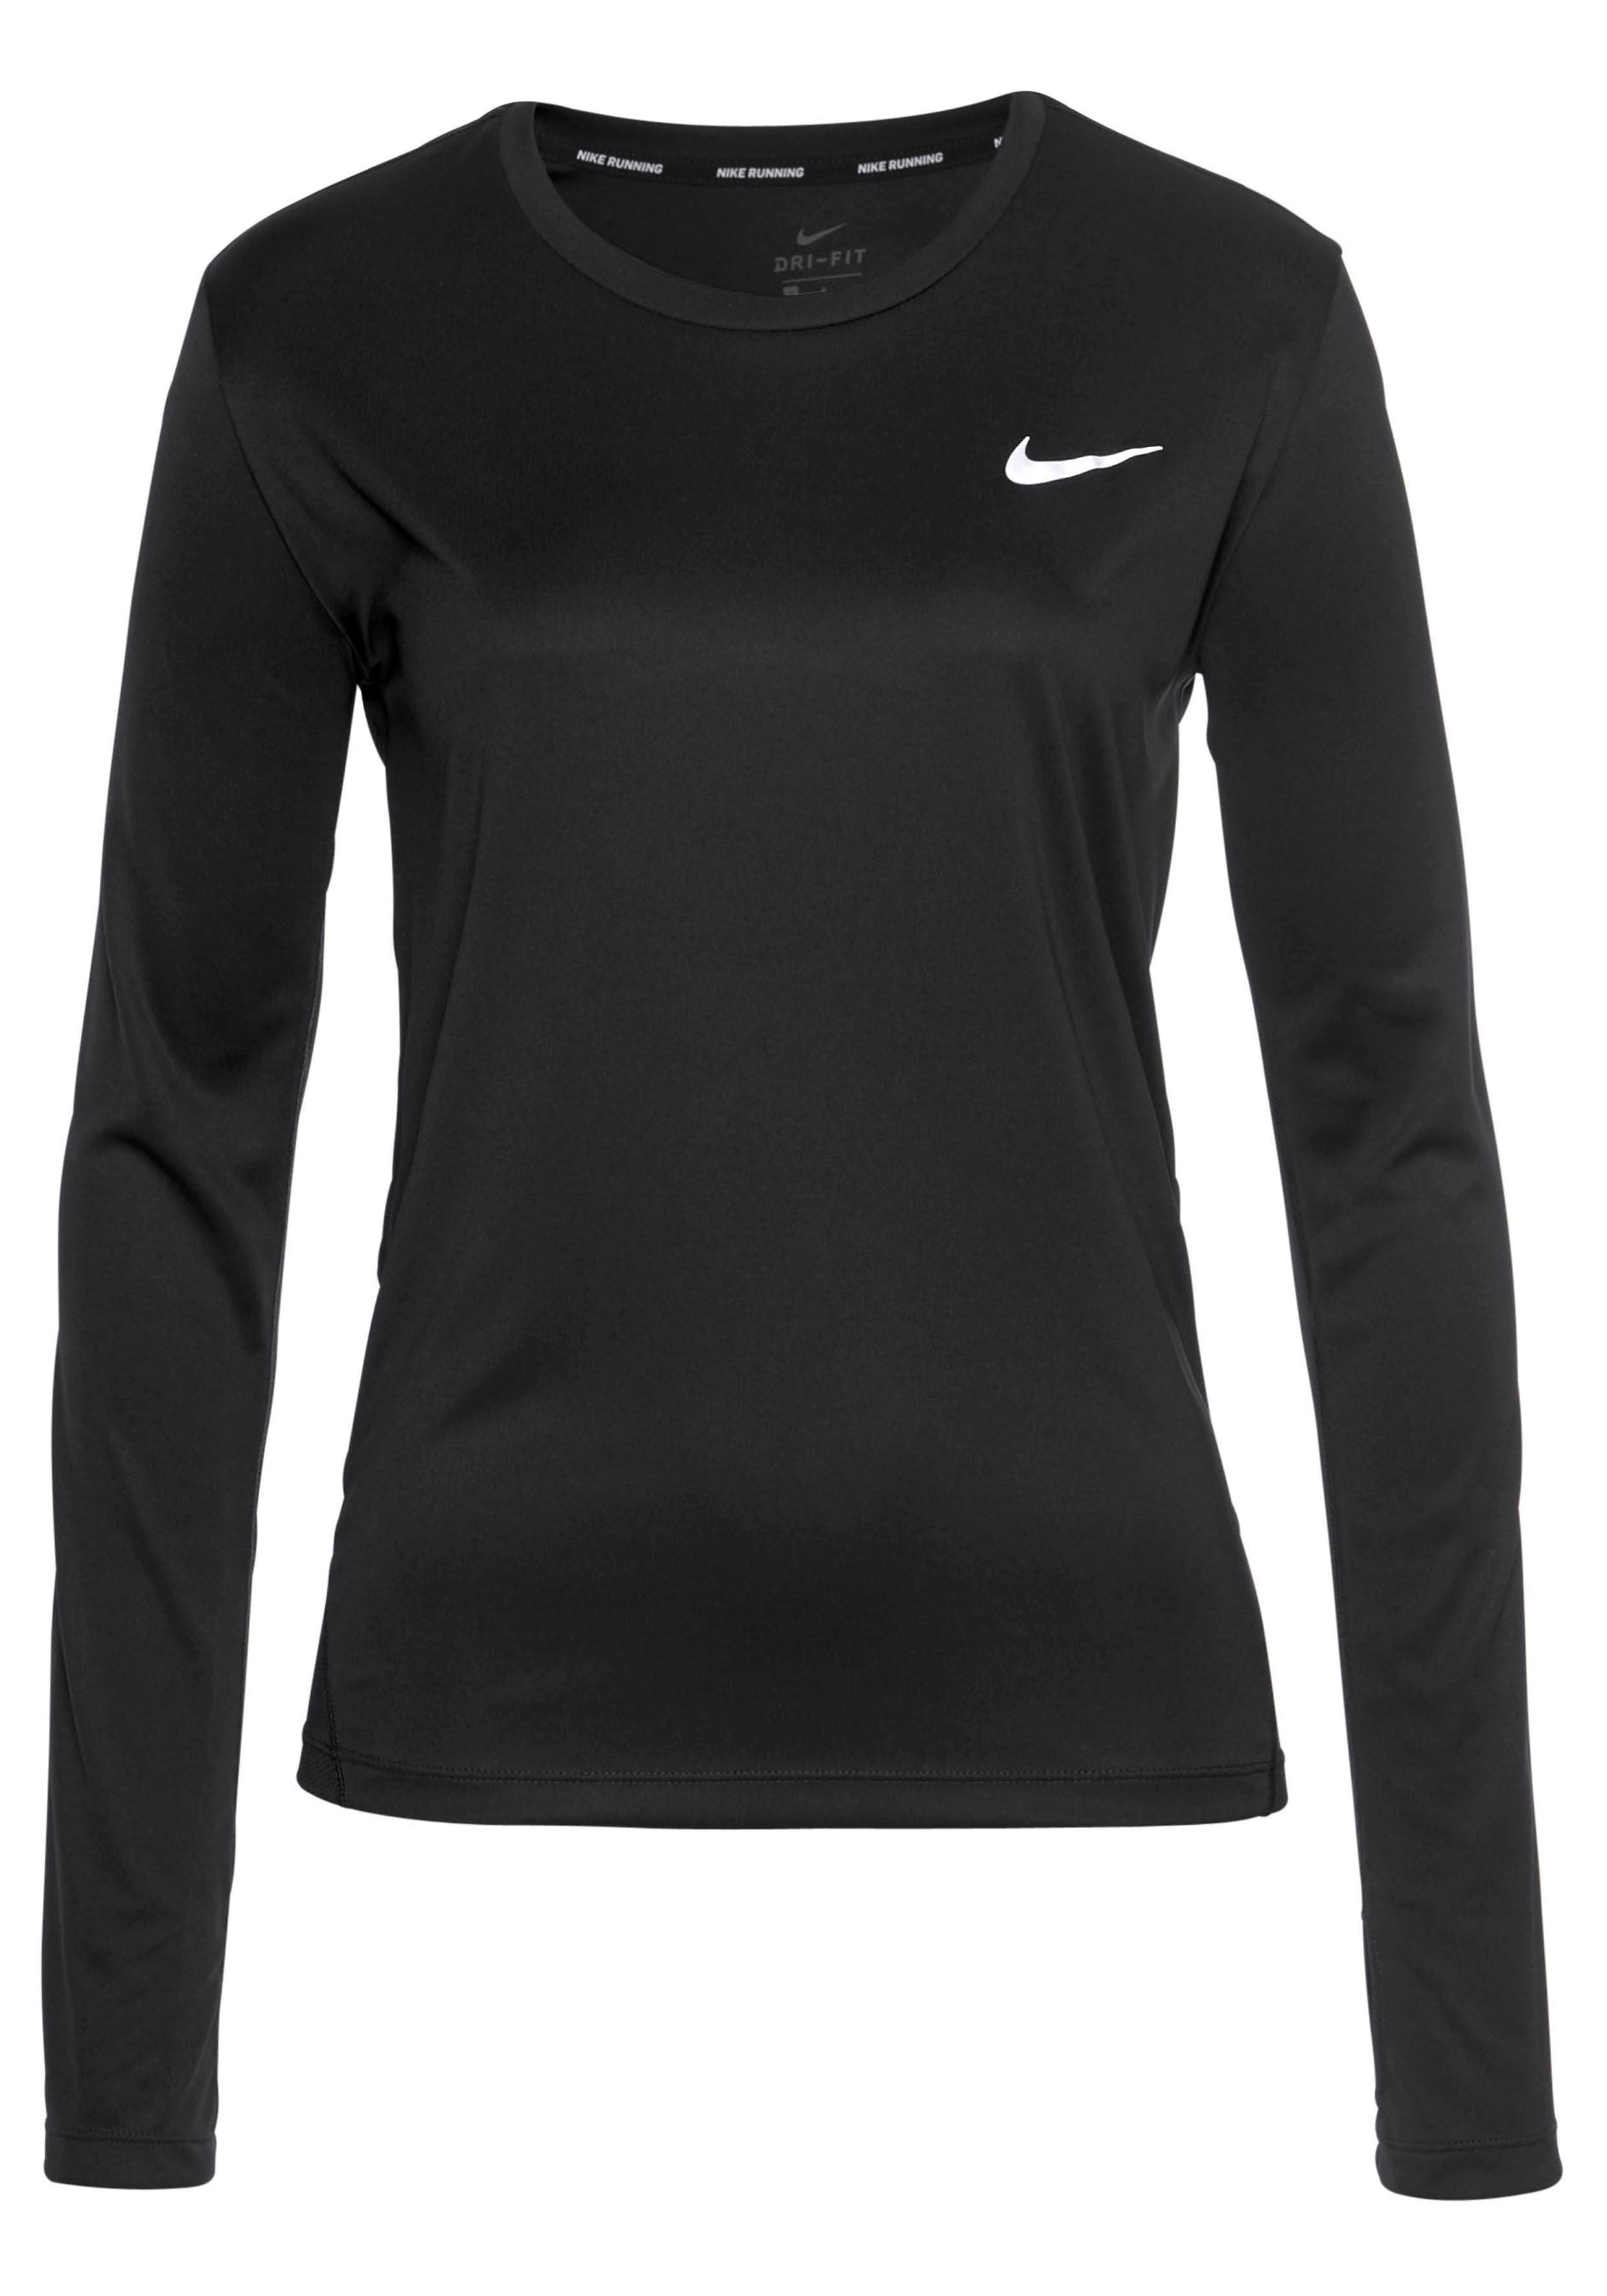 Nk Ls Online Nike Miler Top Runningshirtw Verkrijgbaar uT1lc3KJ5F